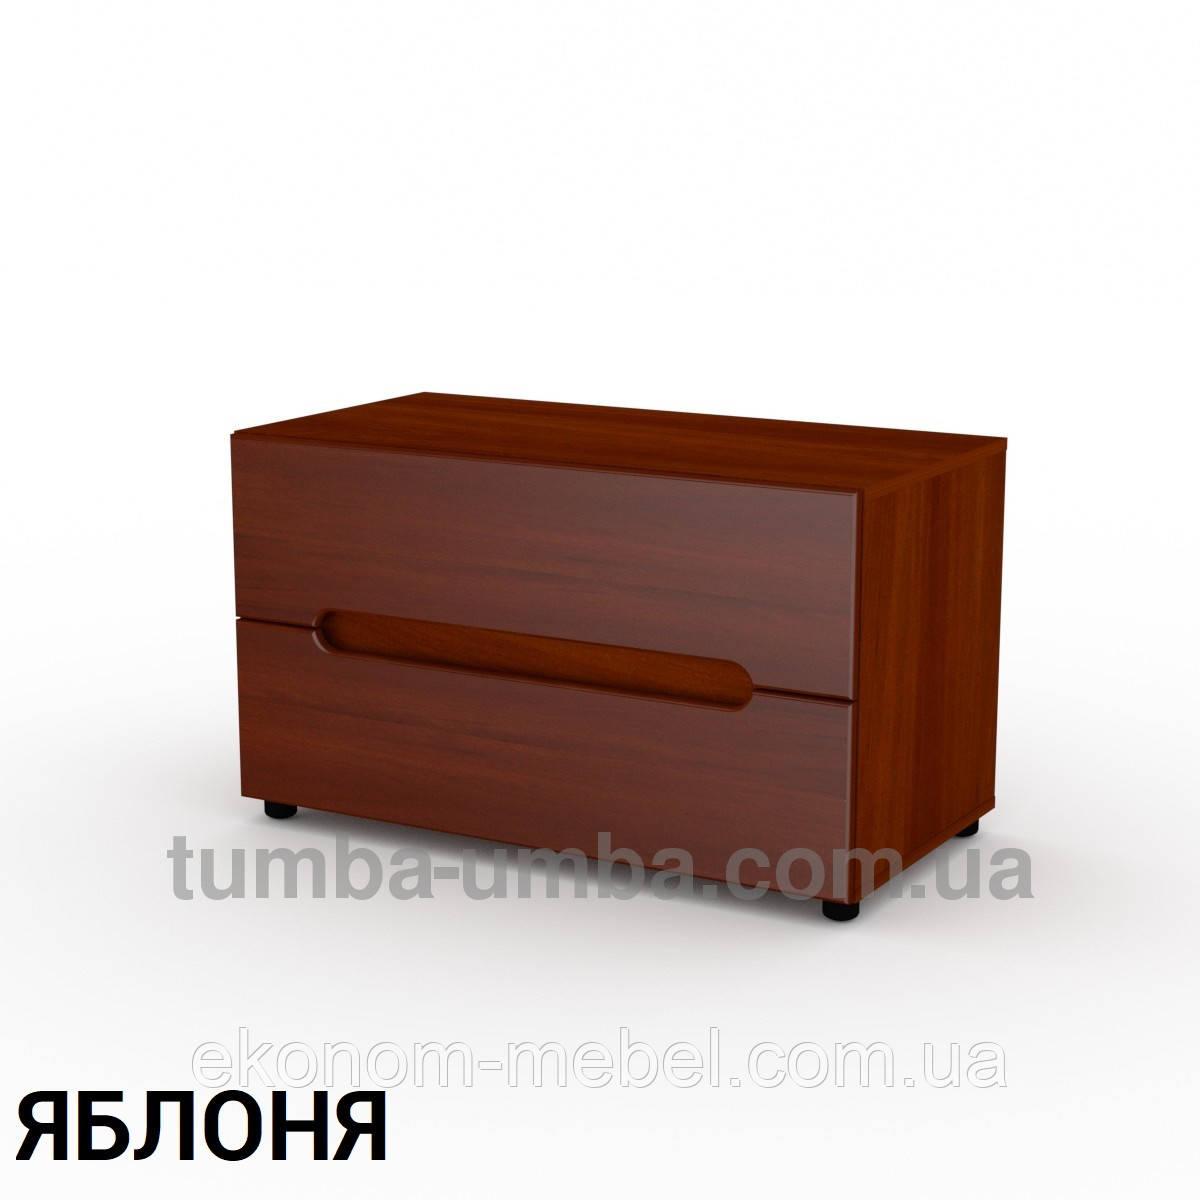 Тумба под телевизор ТВ-4 МДФ